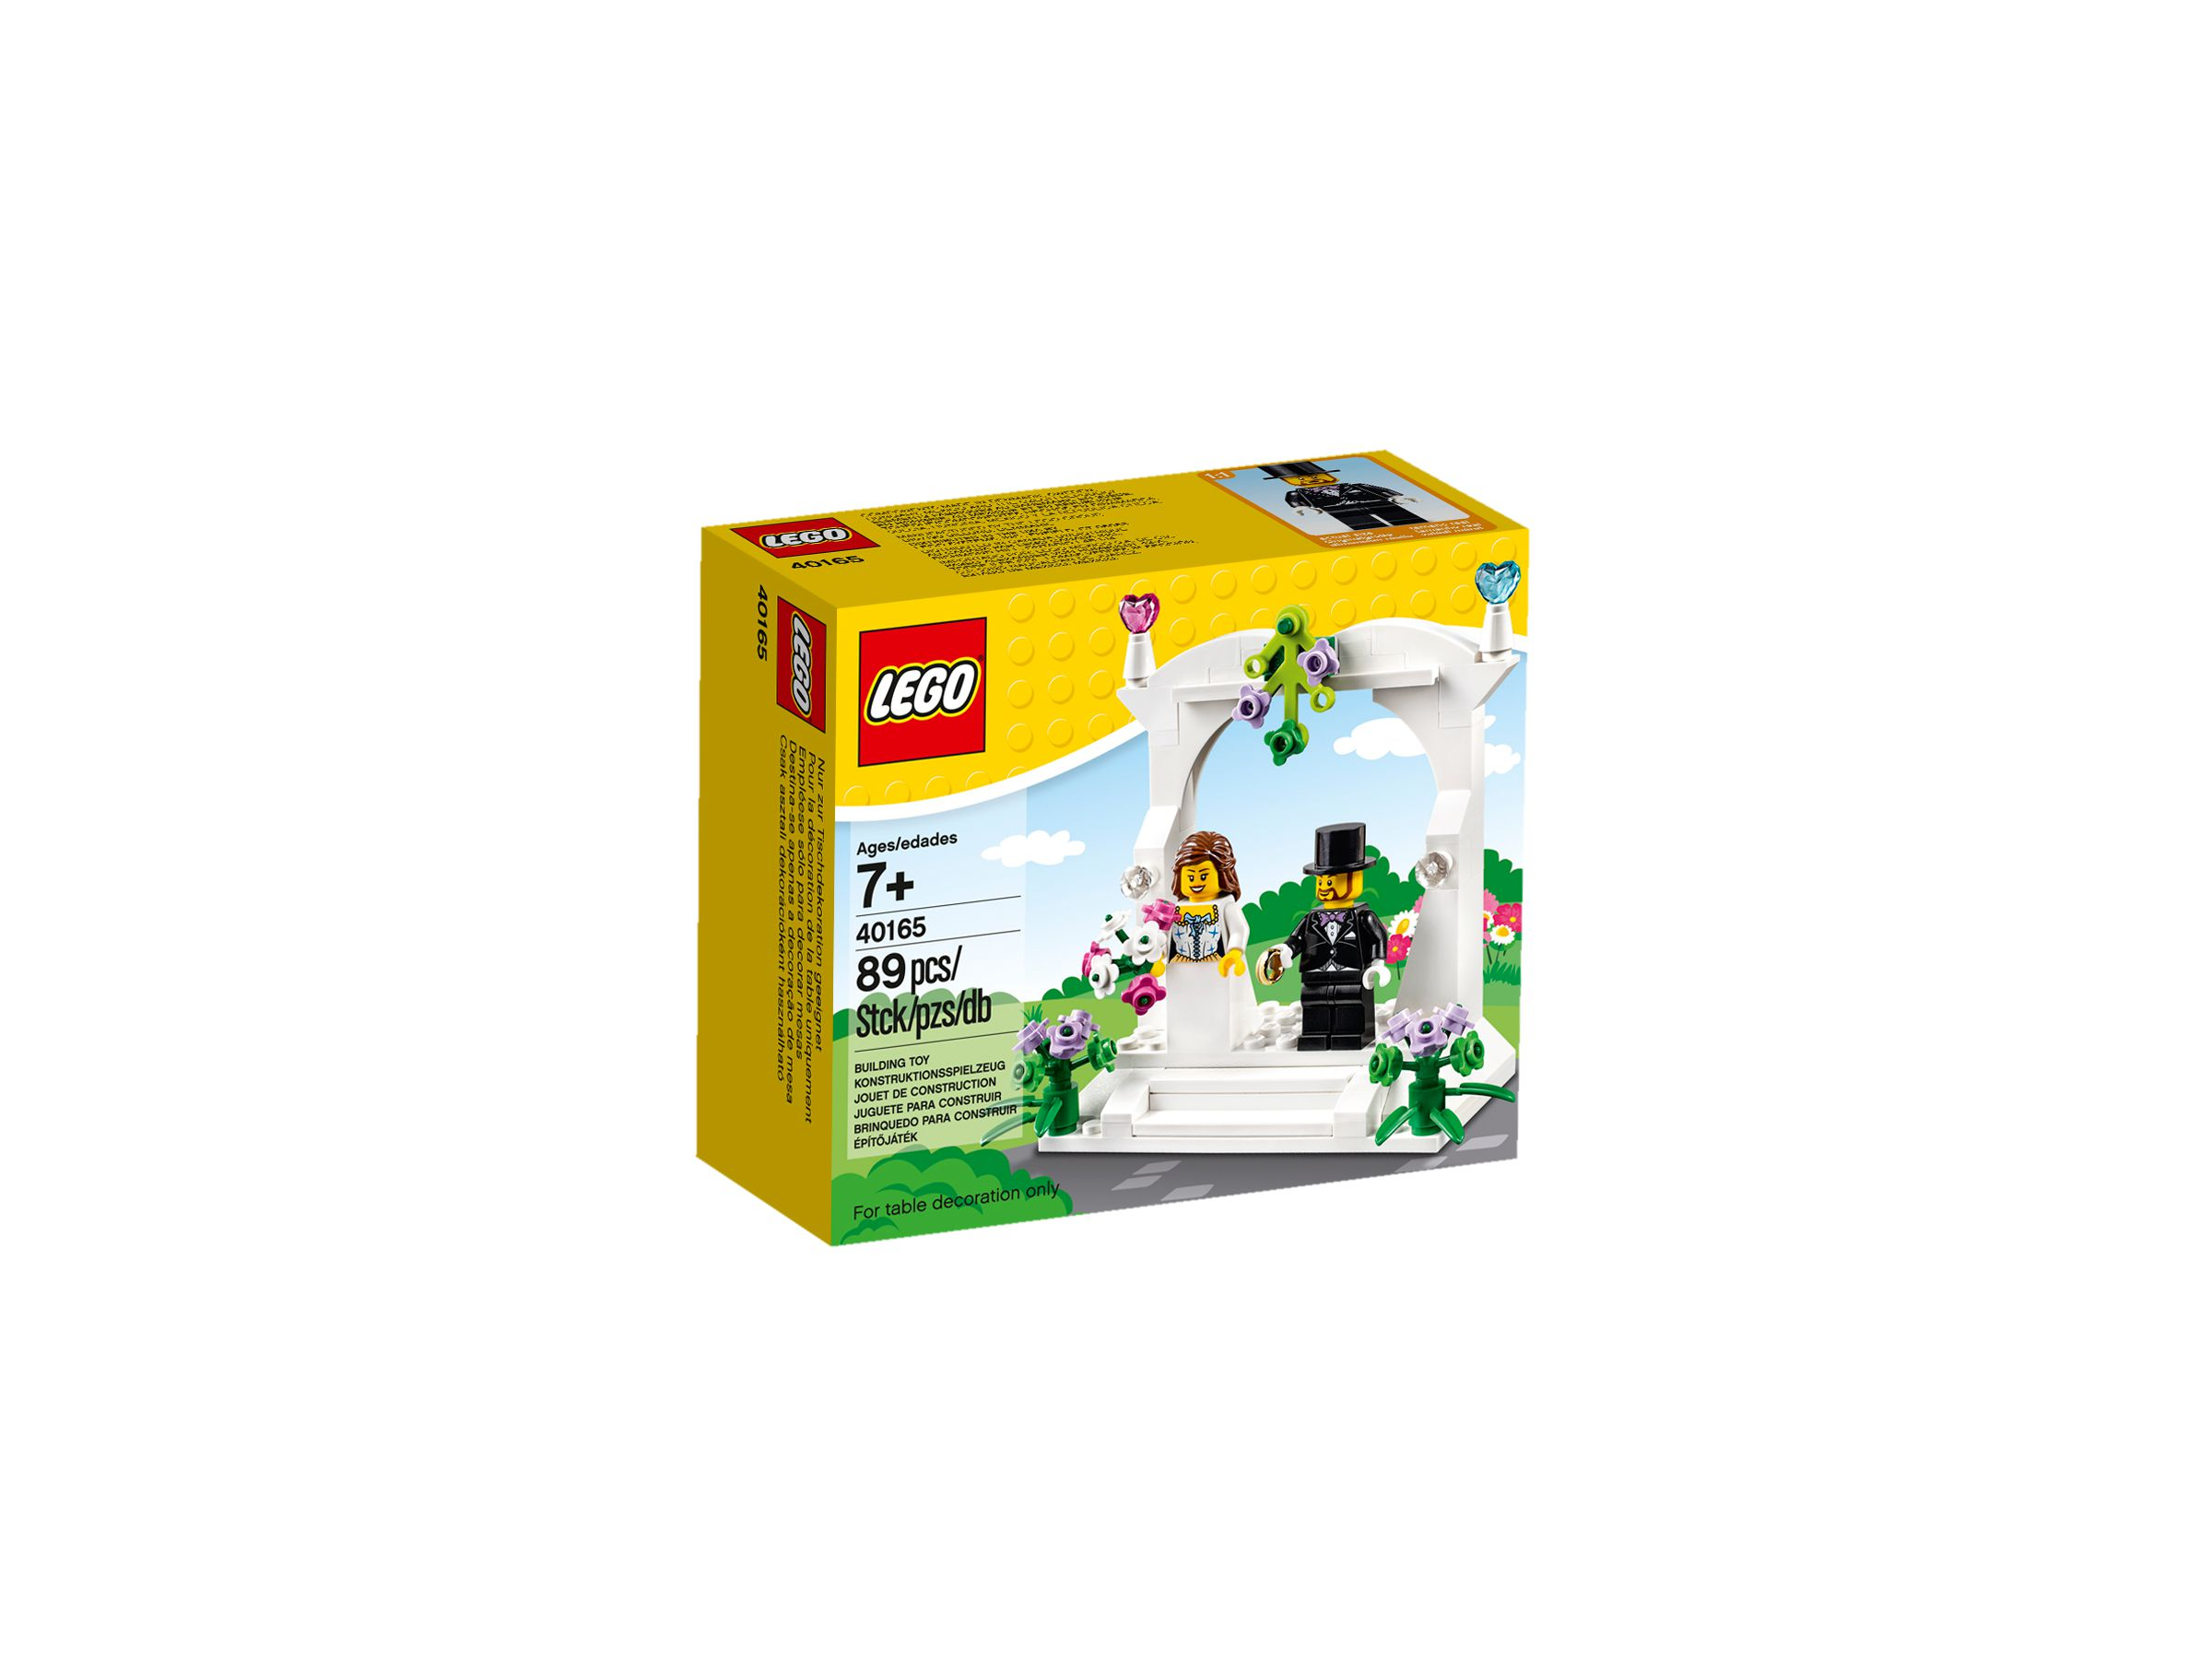 lego 40165 minifiguren hochzeits set 2016 minifigure wedding favour set brickmerge. Black Bedroom Furniture Sets. Home Design Ideas